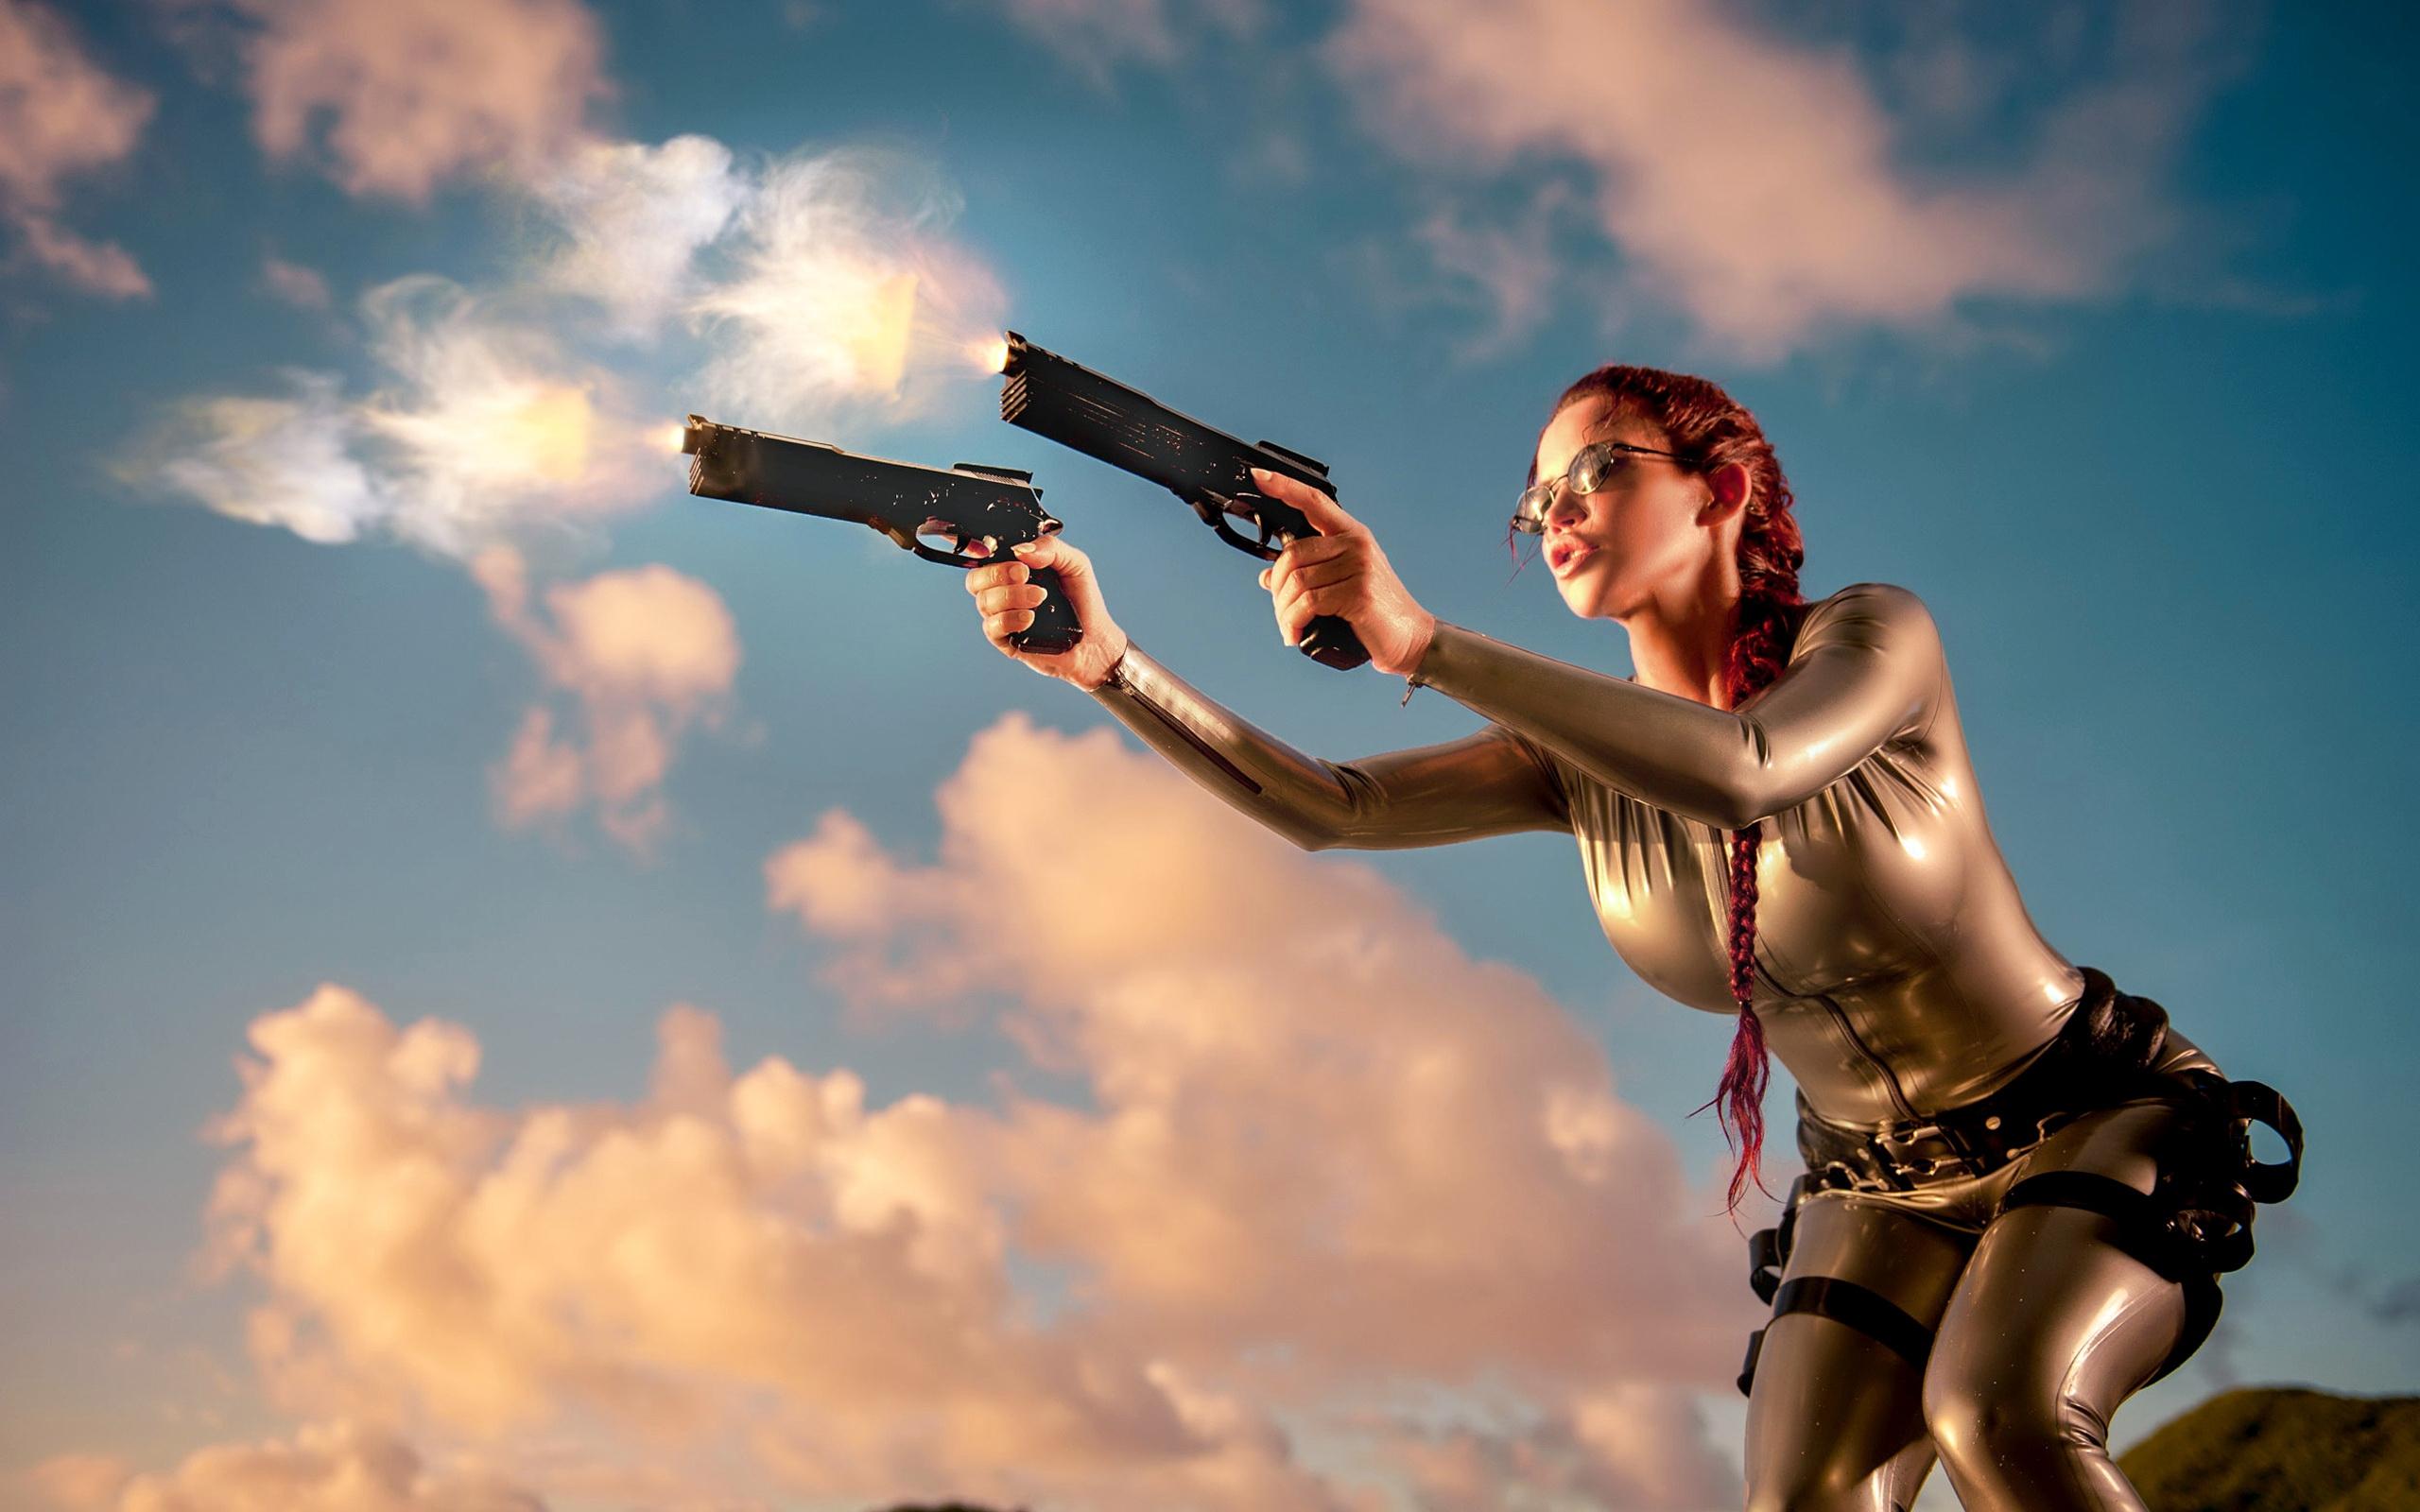 7680x4320 Lara Croft 8k Artwork 8k Hd 4k Wallpapers: Cosplay Wallpapers, Photos And Desktop Backgrounds Up To